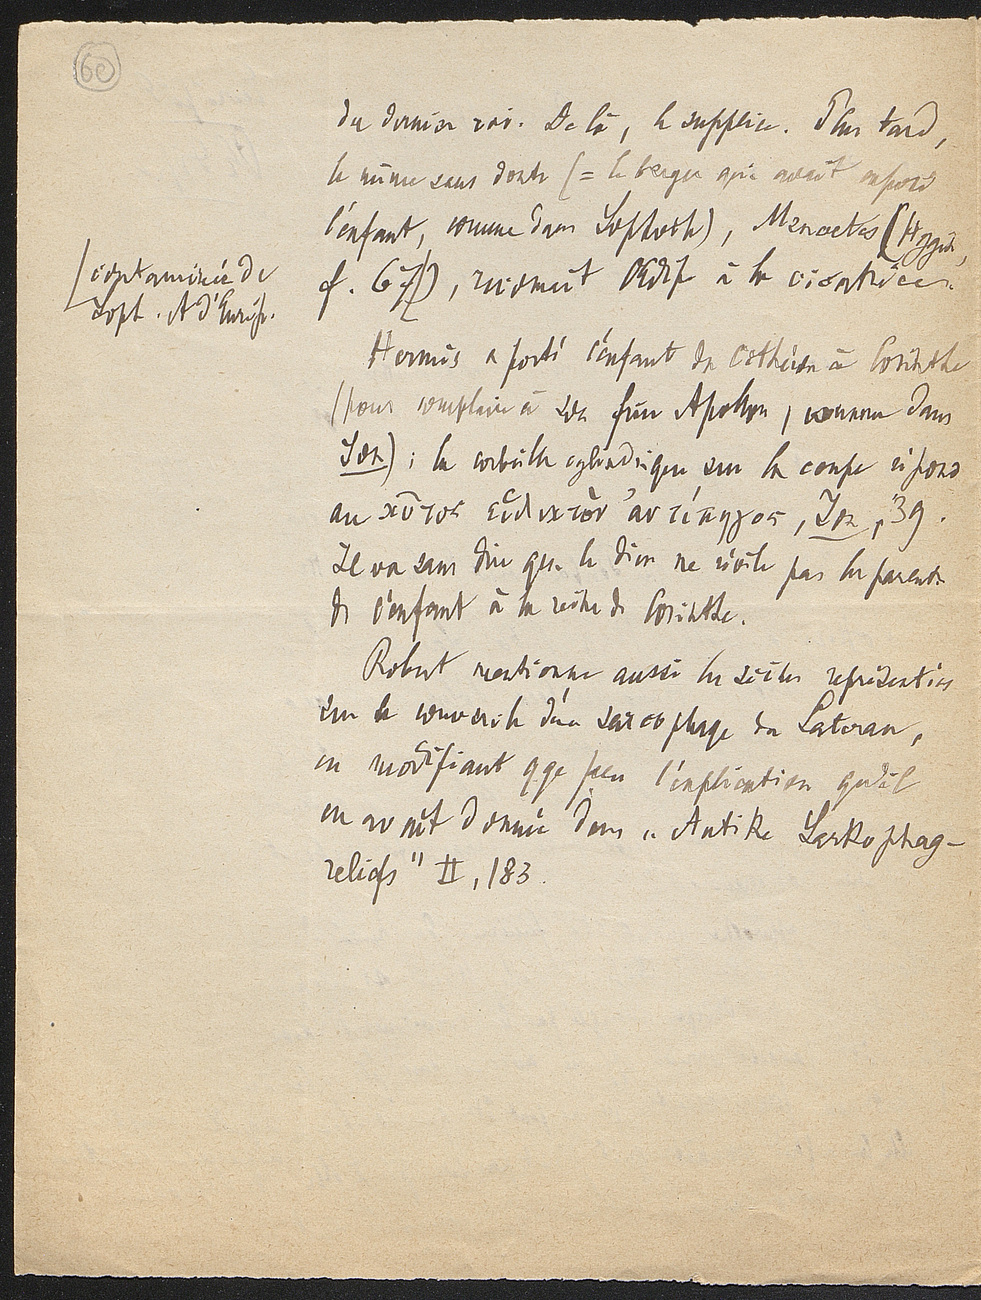 [folio 60 : foliotation de la main de bibliothécaire]